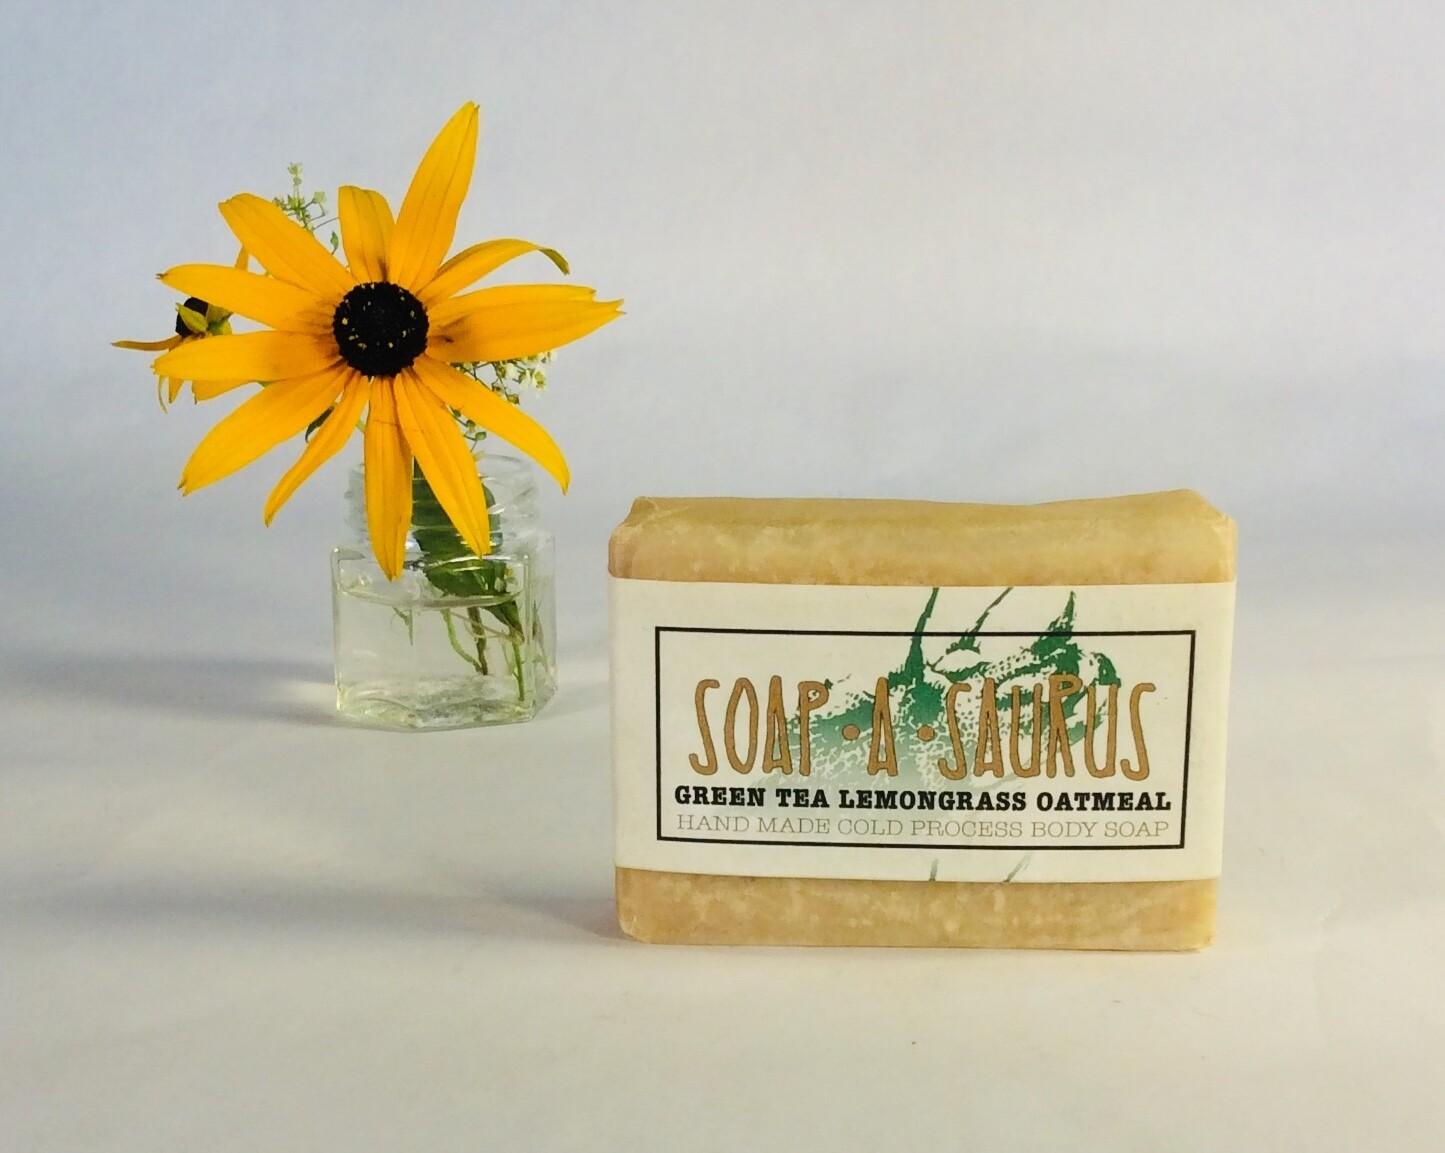 soap, bar, all-natural, handmade, Green Tea Lemongrass Oatmeal; Soap-A-Saurus; each